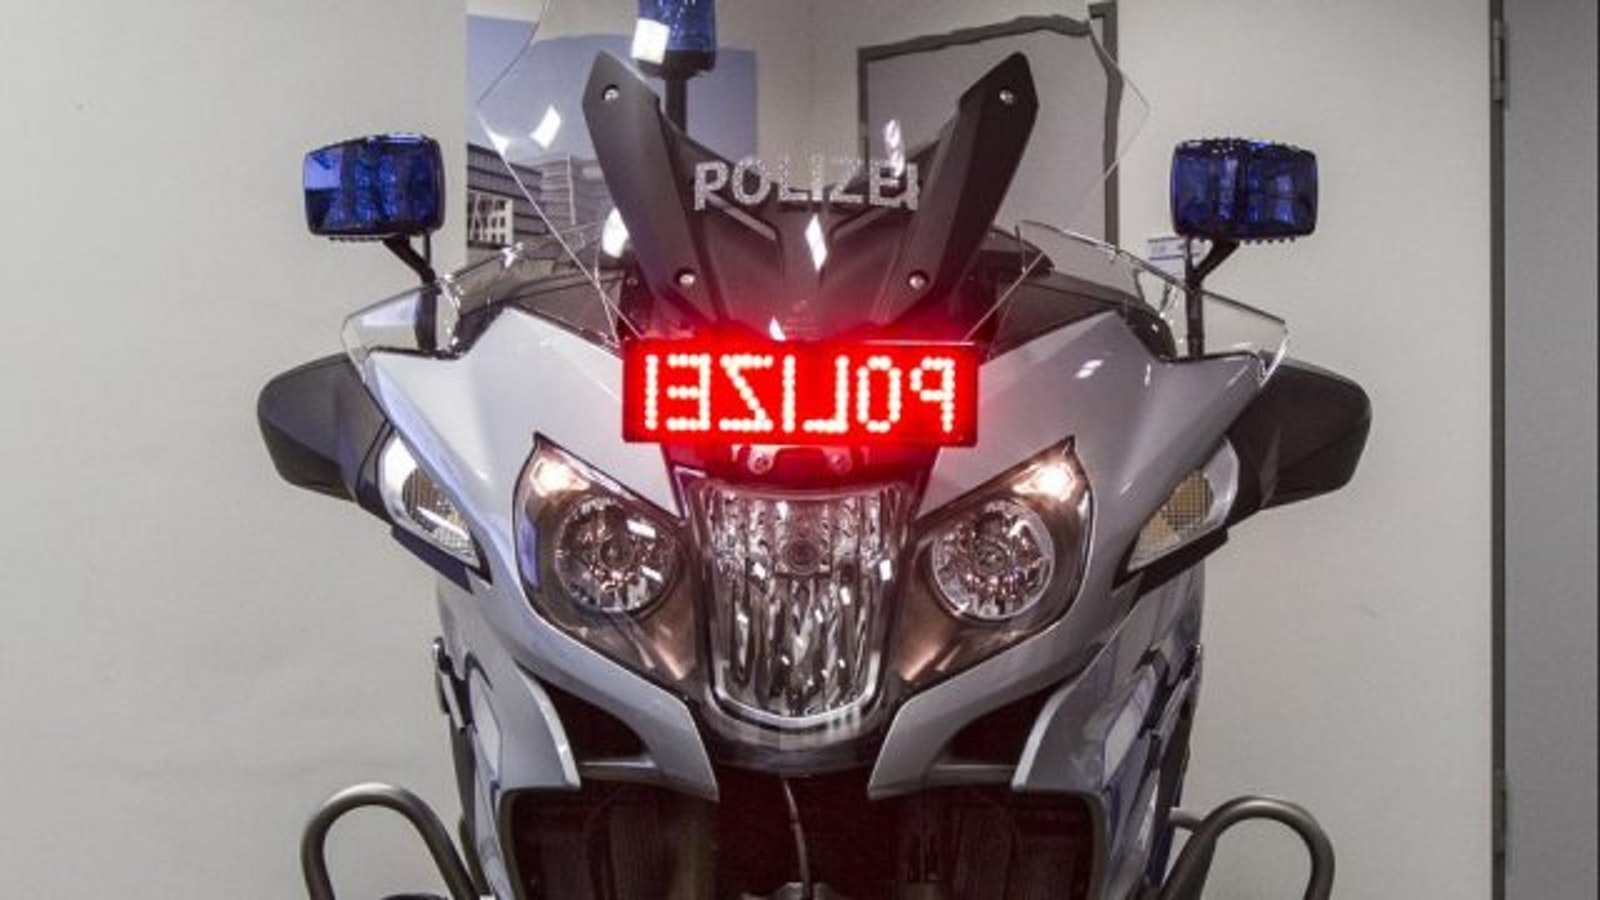 Akense Politie